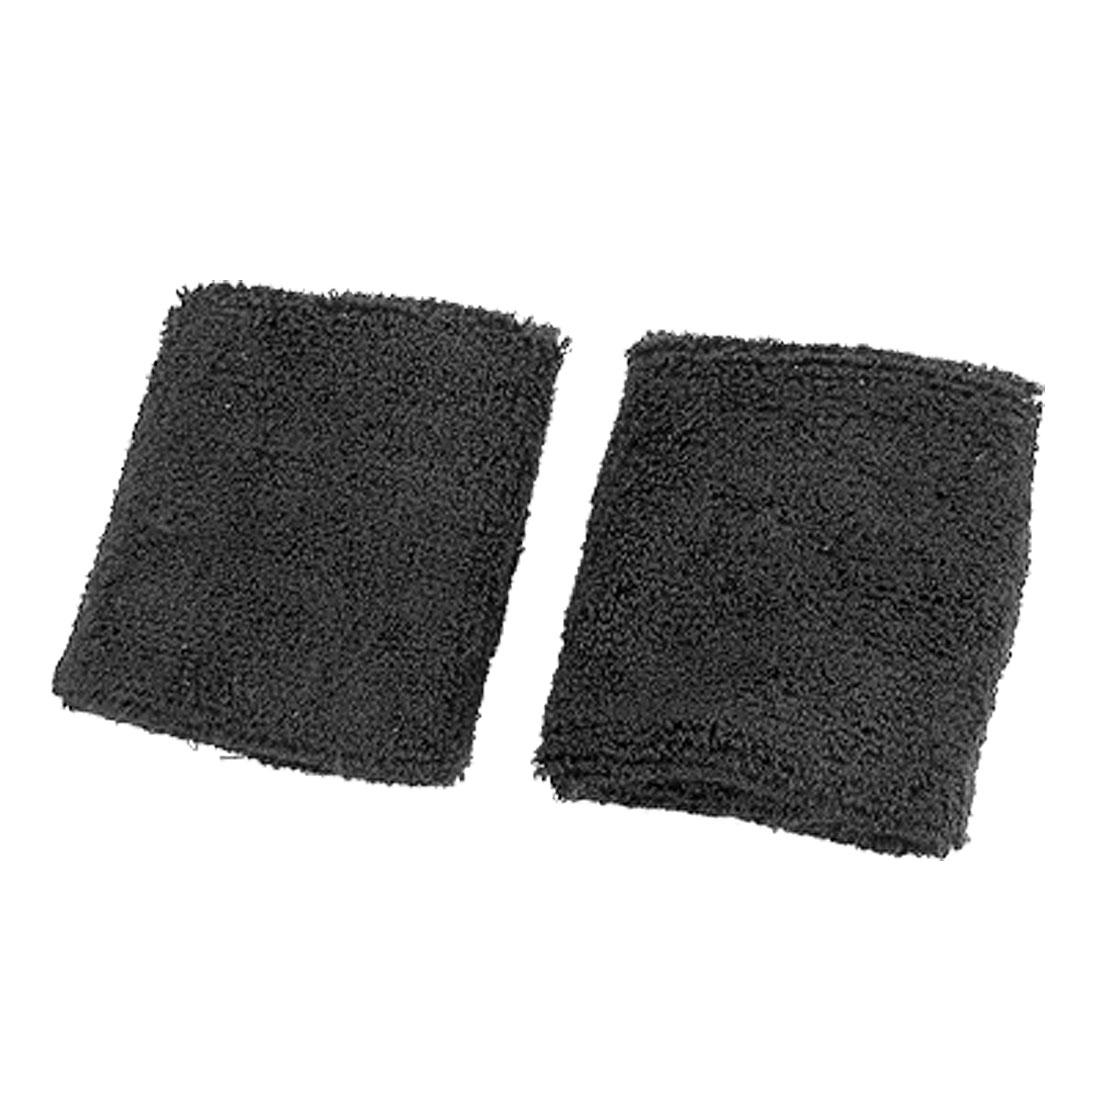 Black Elastic Terrycloth Sports Badminton Tennis Wristband 2PCS